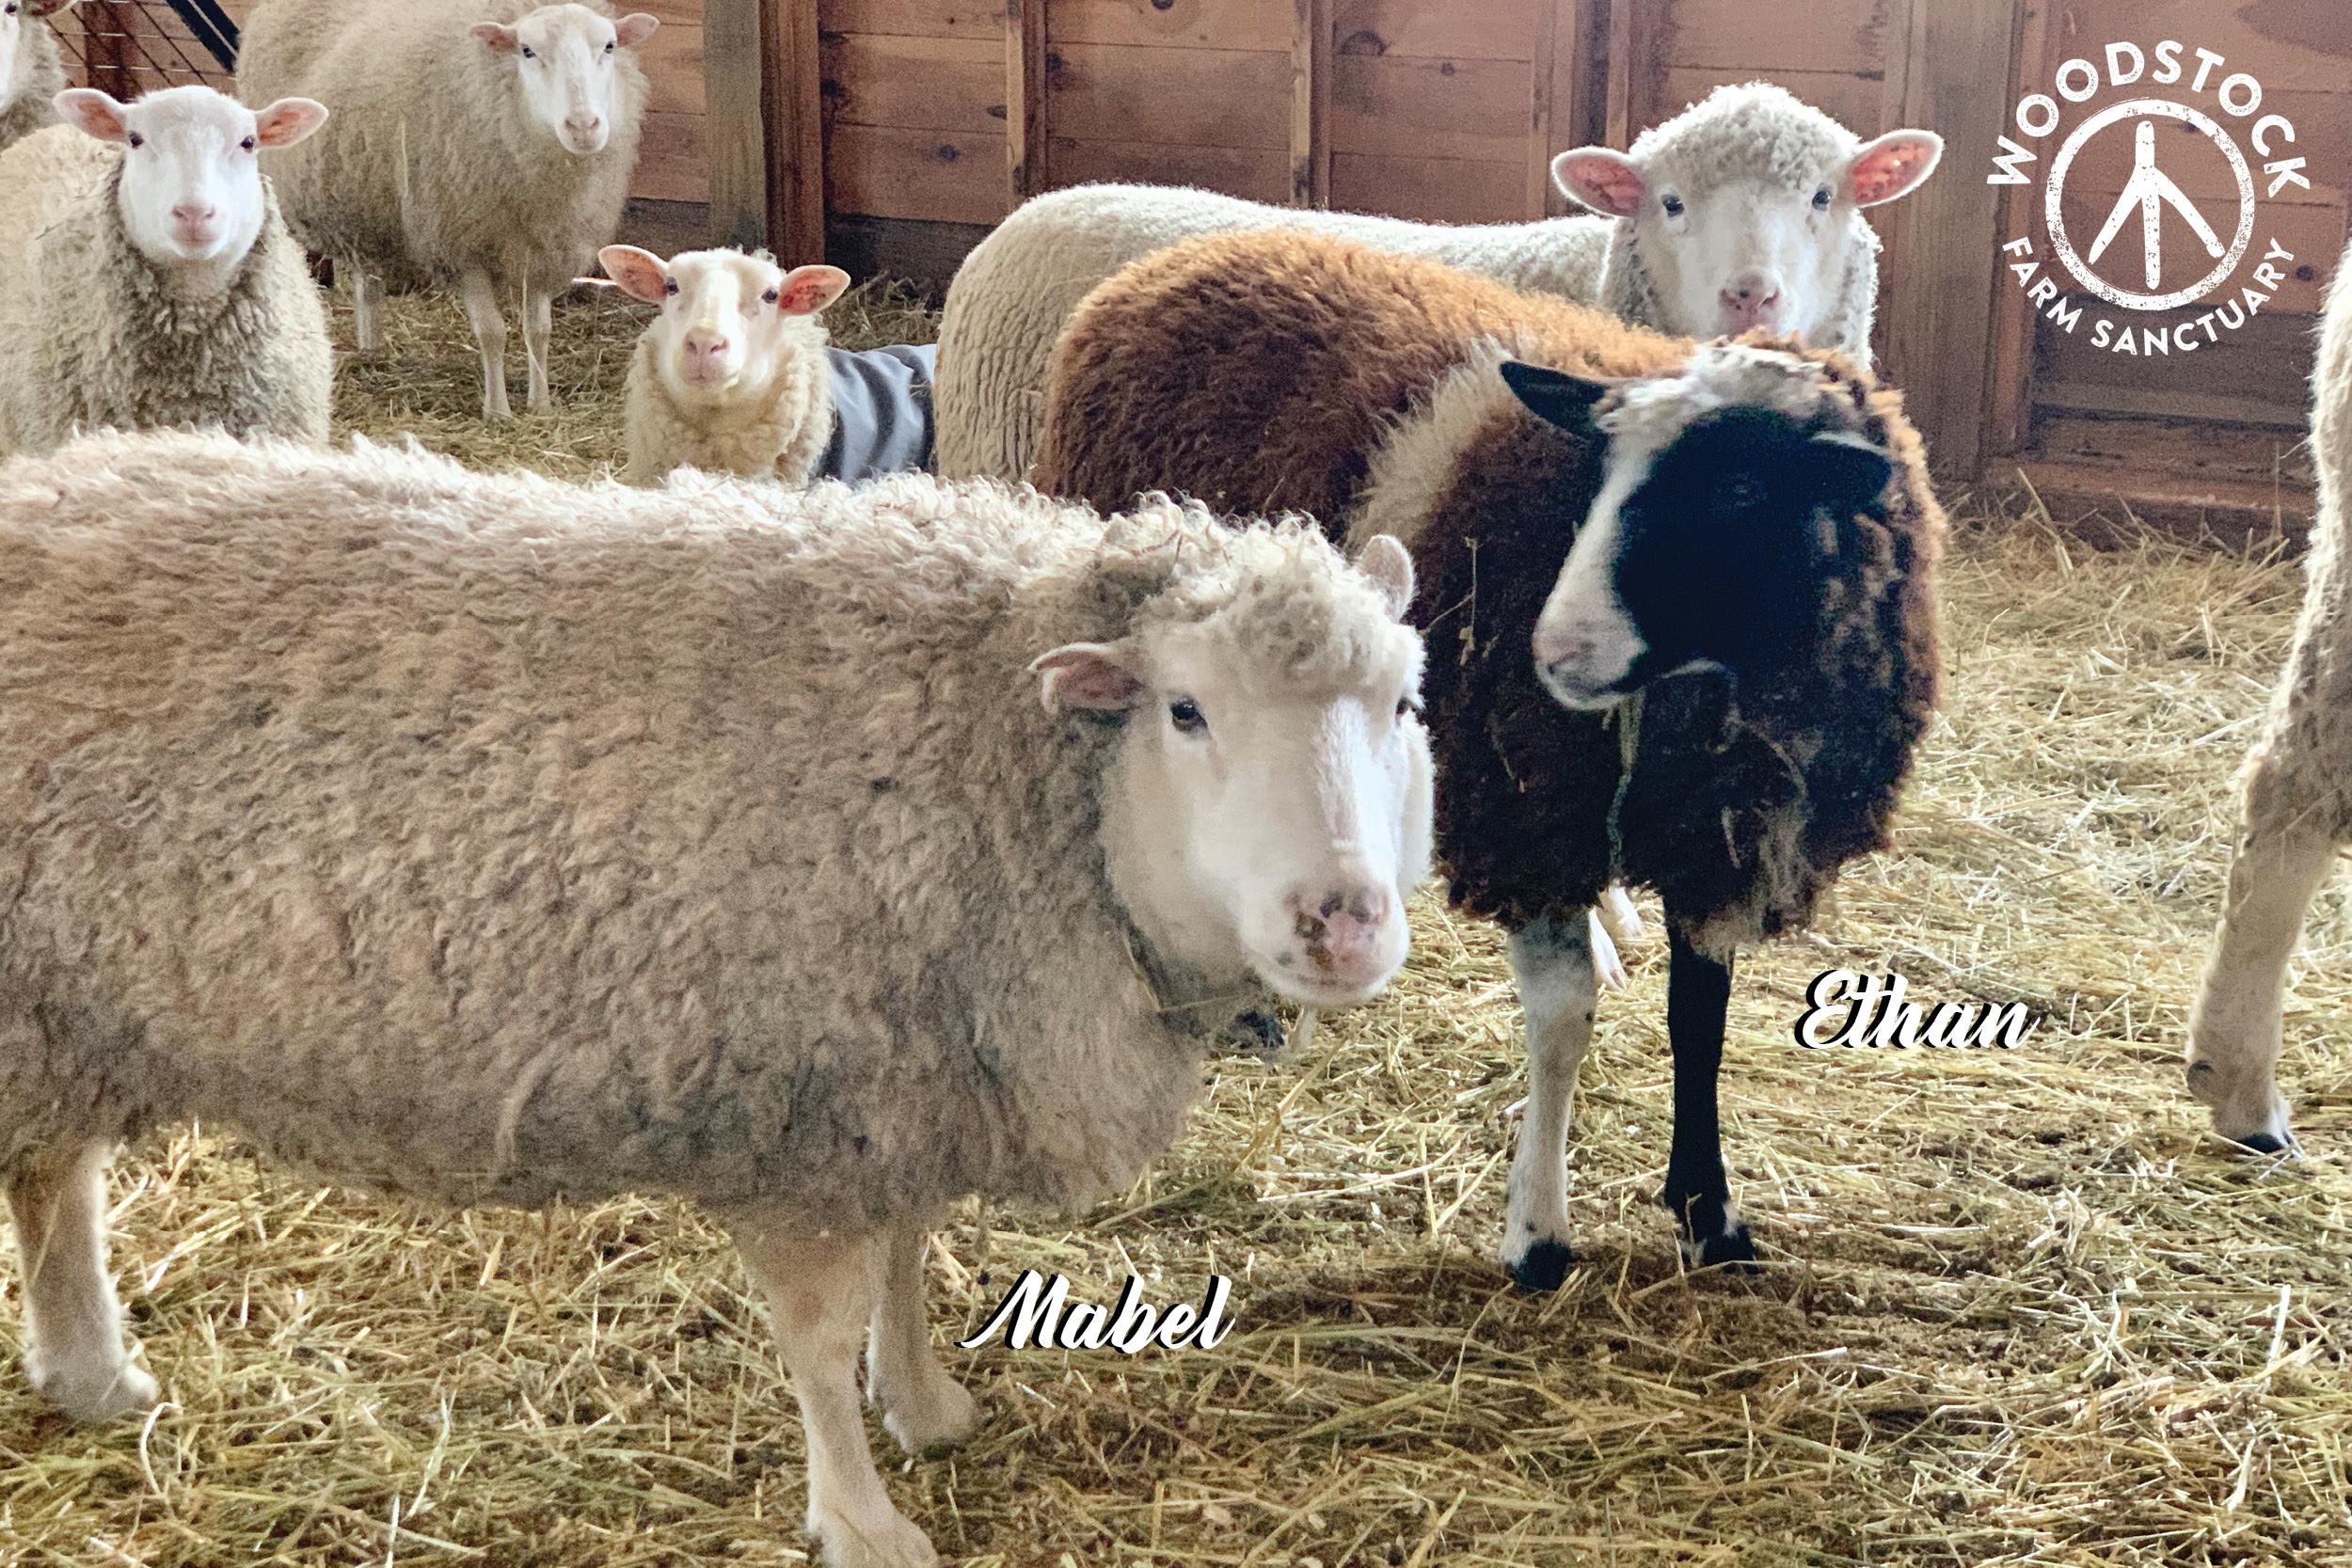 The sheep of Woodstock Farm Sanctuary